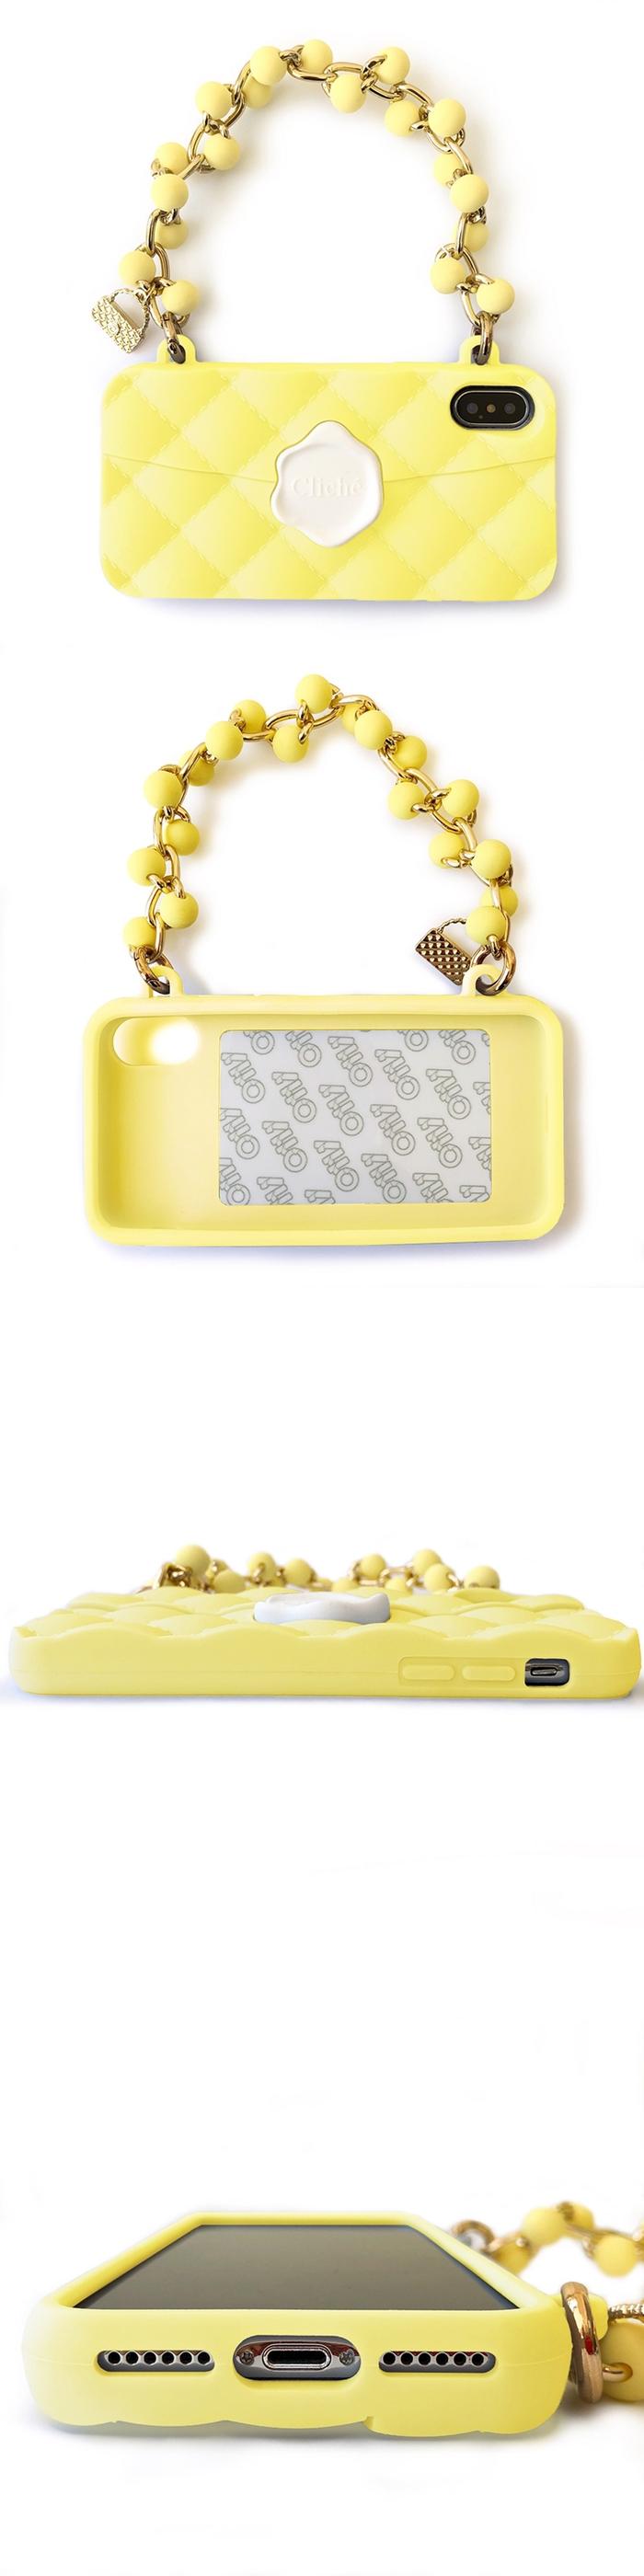 Candies 珠鍊經典晚宴包(黃)-IPhone X/XS